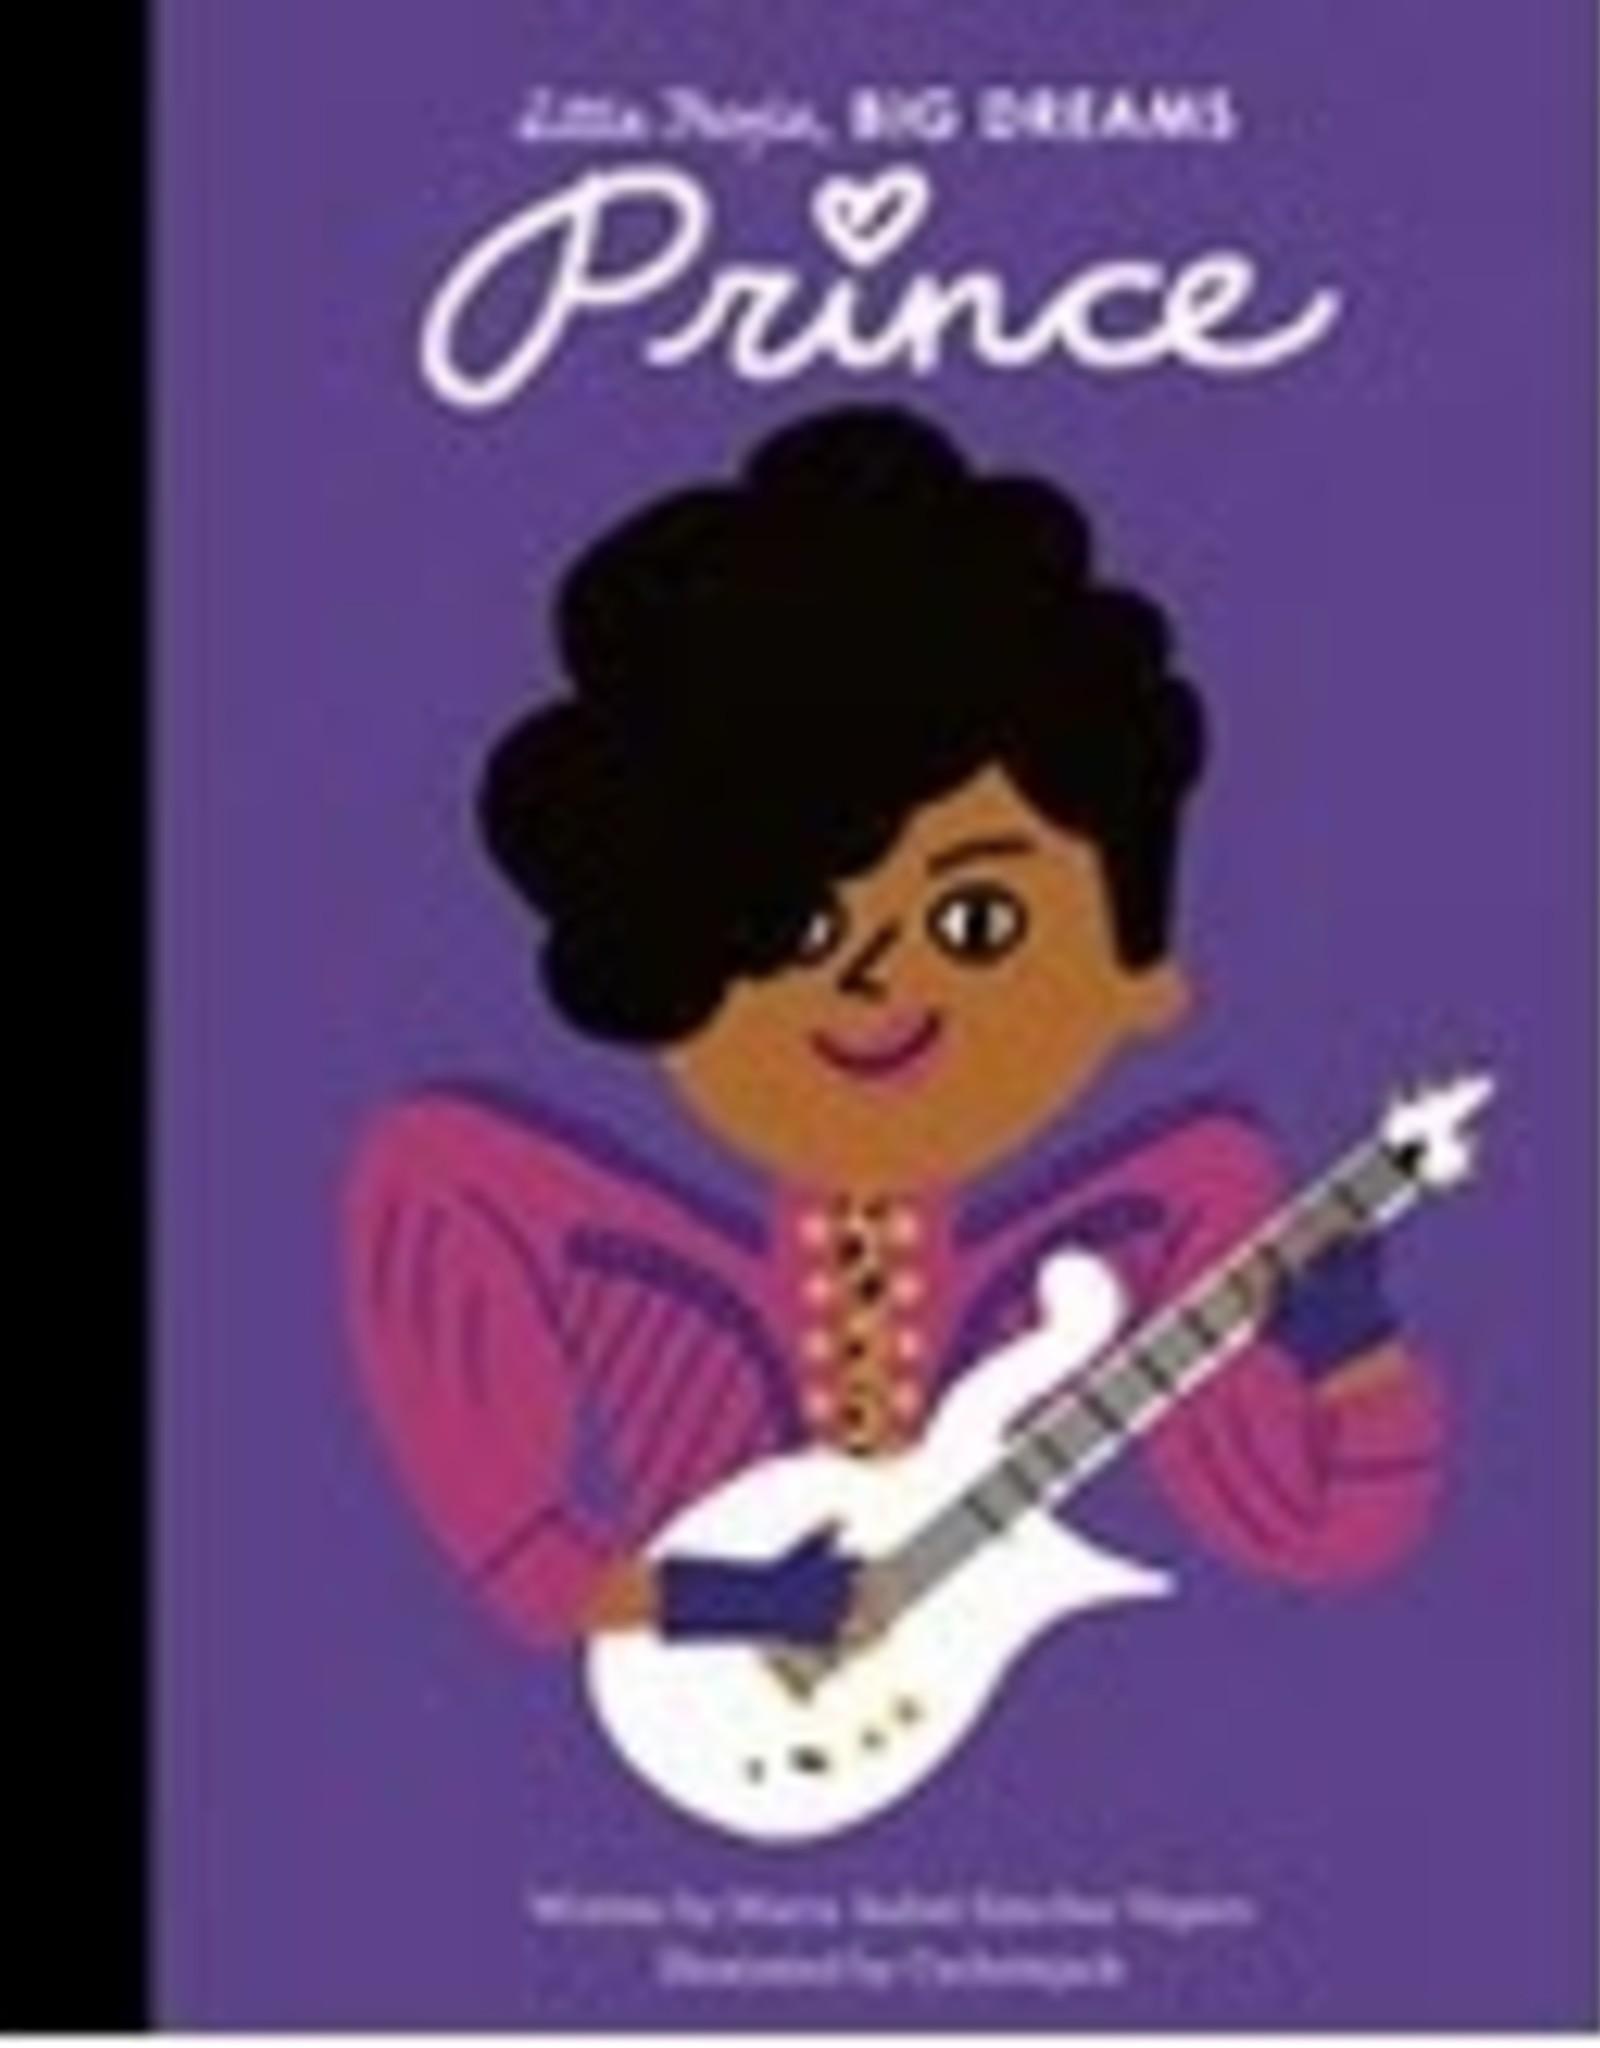 Little People, Big Dreams - Prince